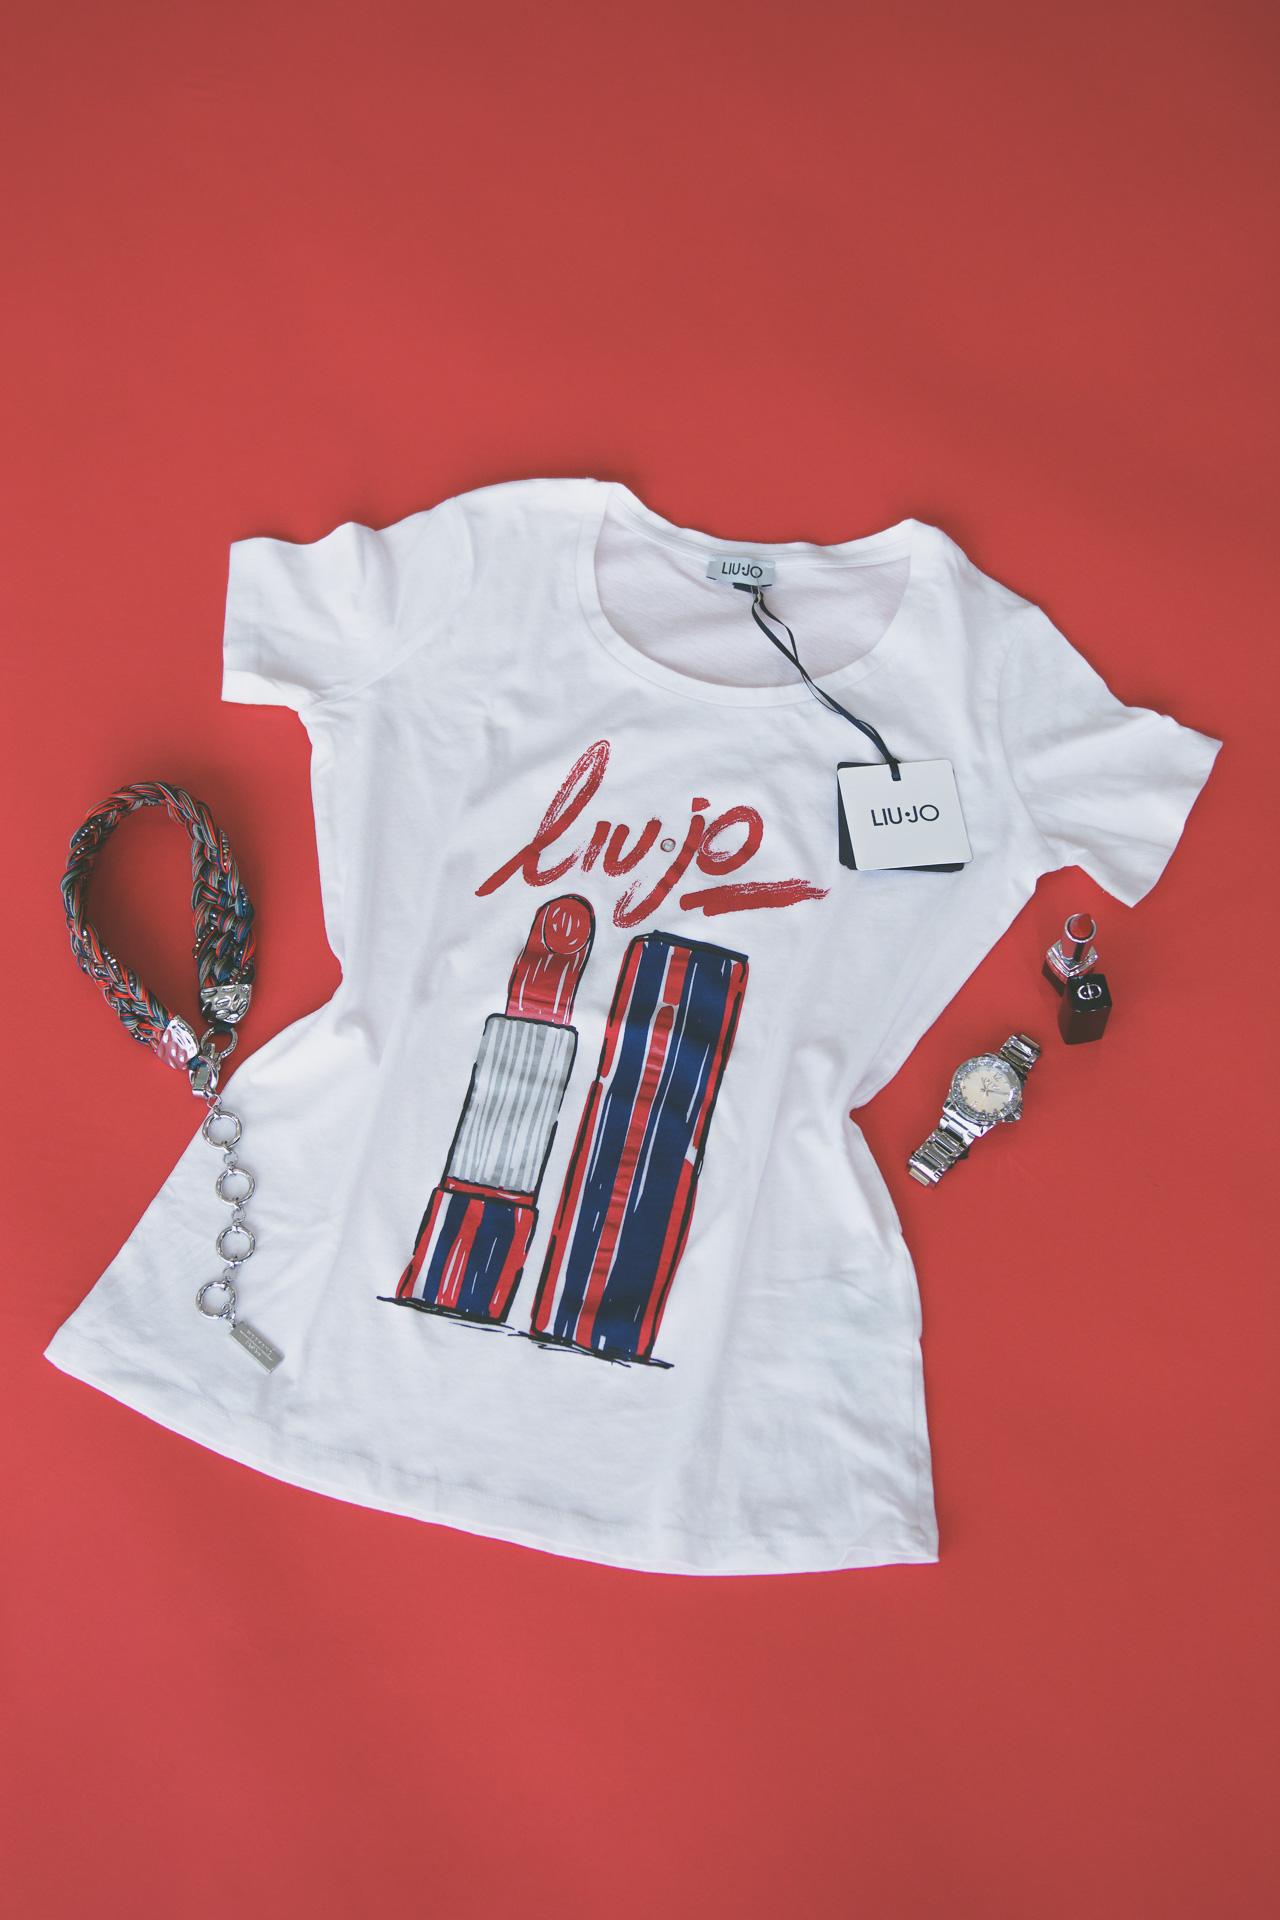 Liu Jo t-shirt valentine days gift